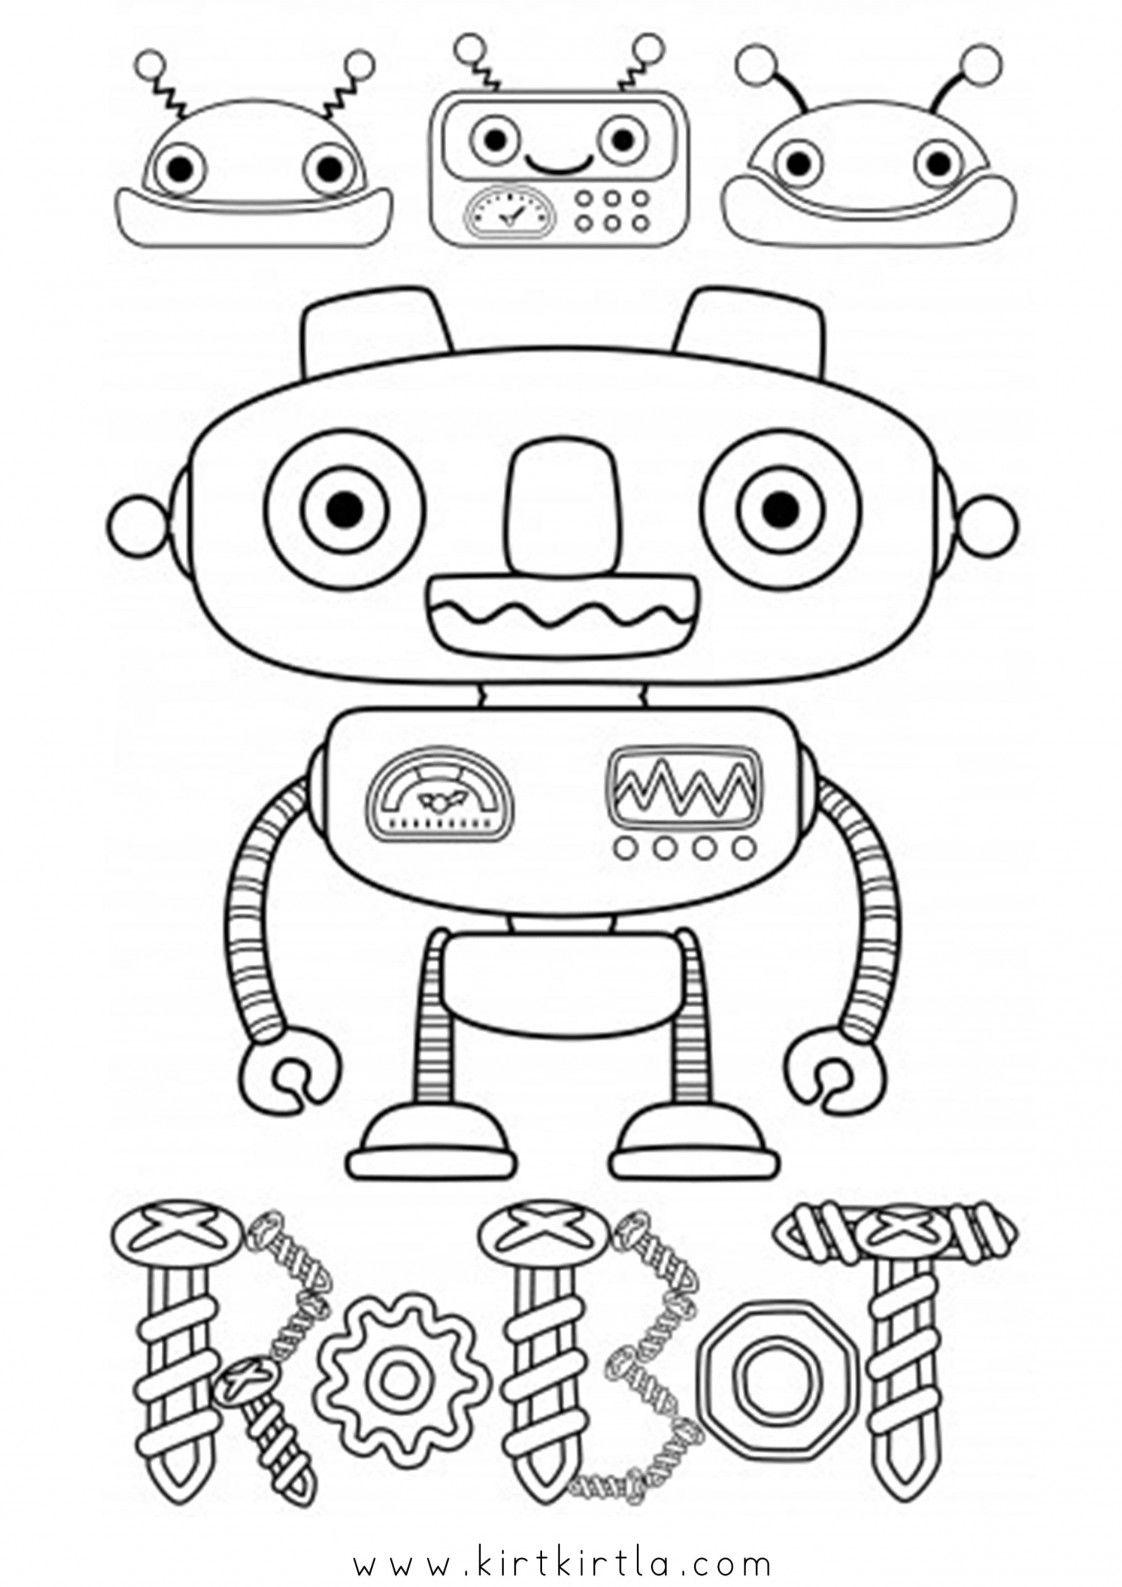 Robot Boyama Sayfalari Kirtkirtla Robot Boyama Kagidi Boyama Sayfalari